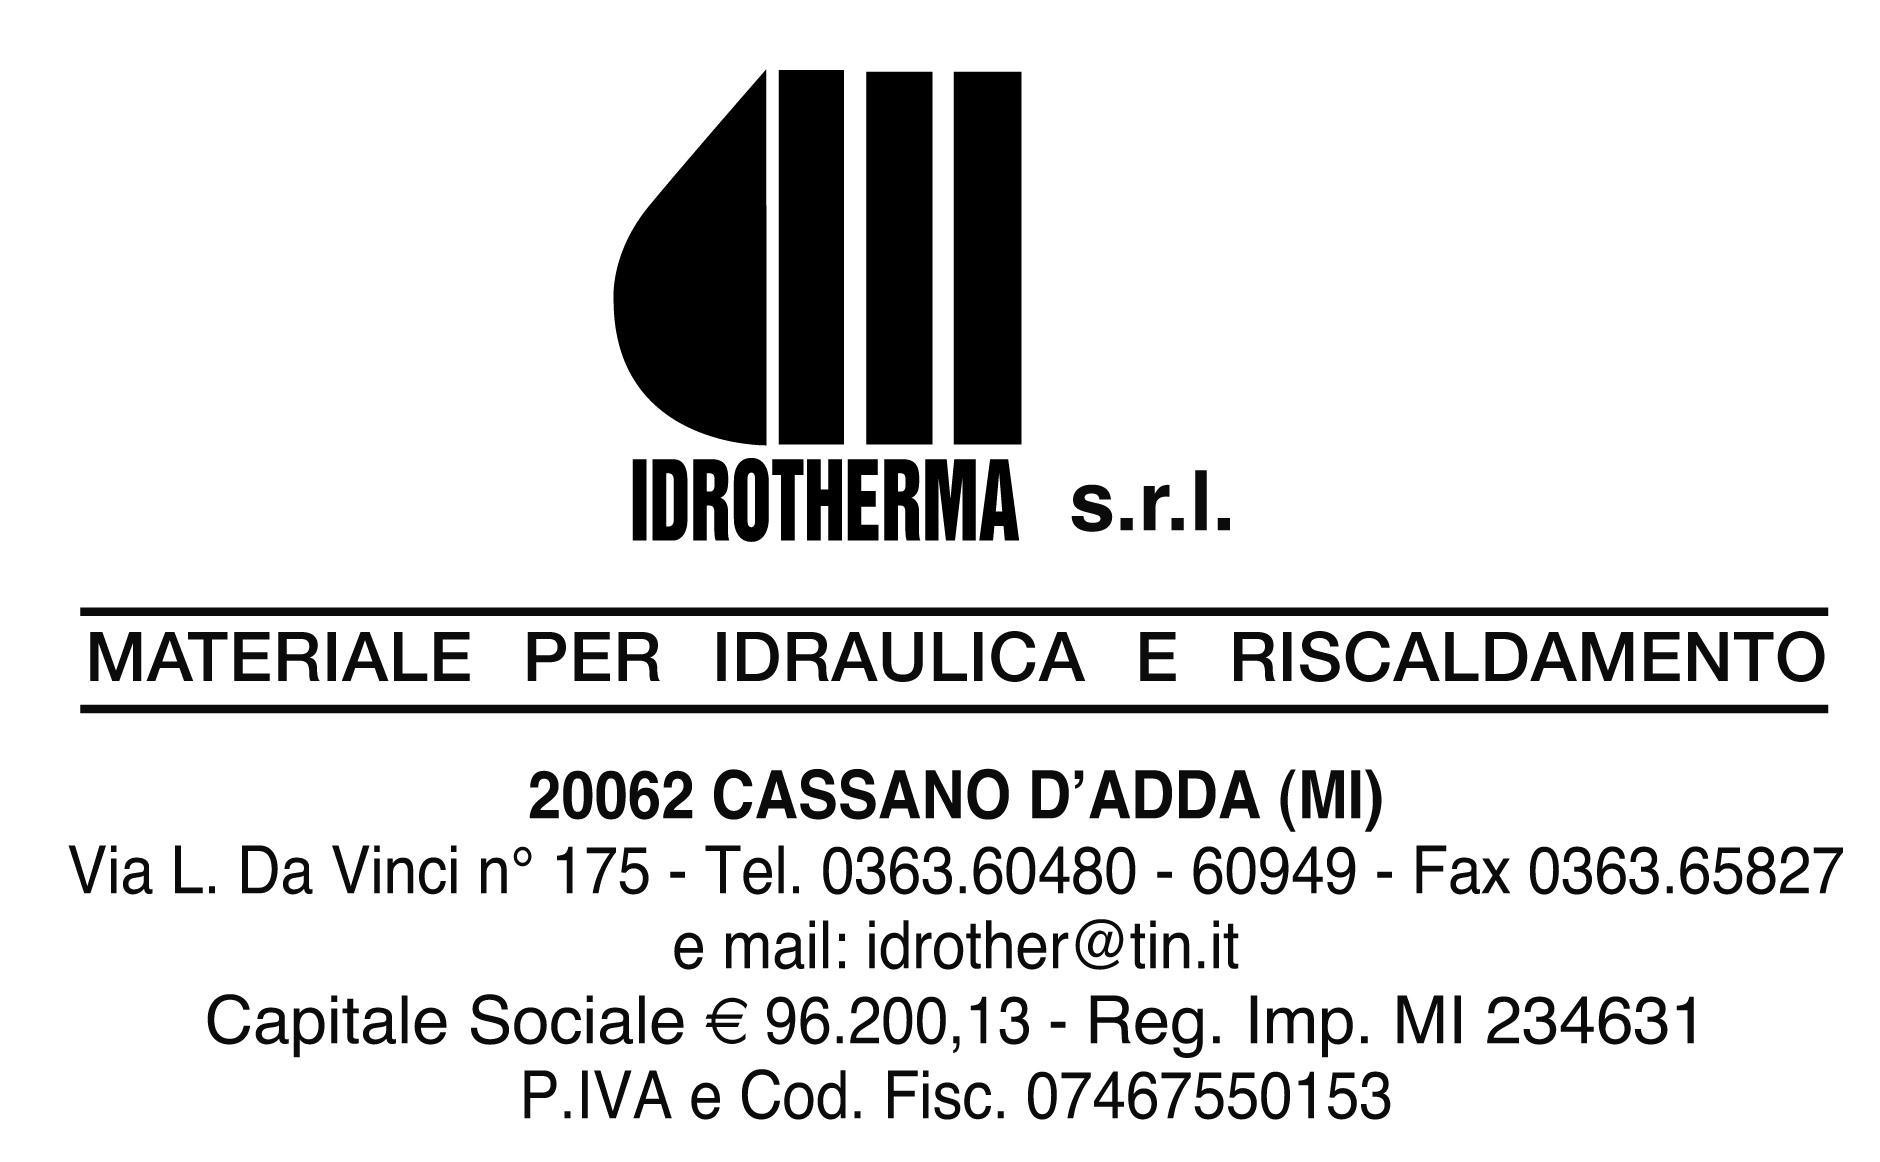 Idrotherma